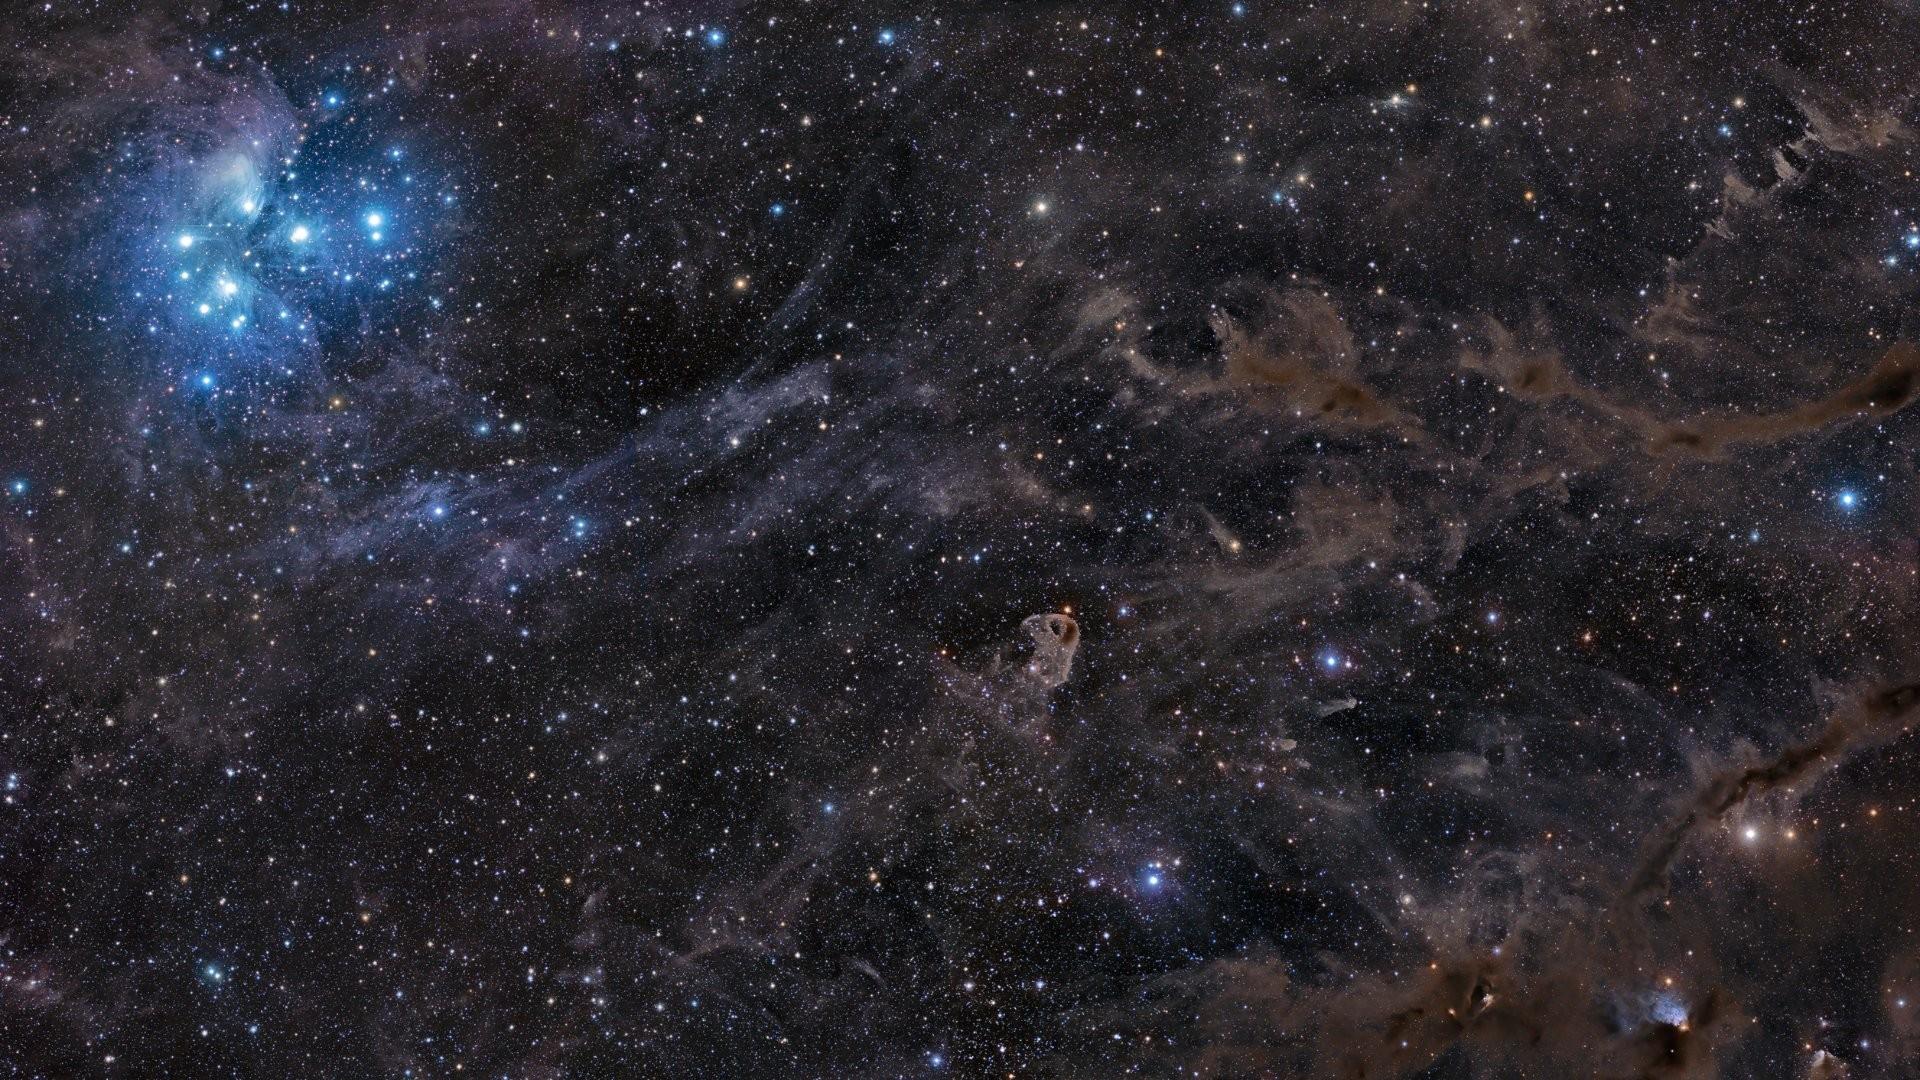 Deep space wallpaper | Wallpaper Wide HD